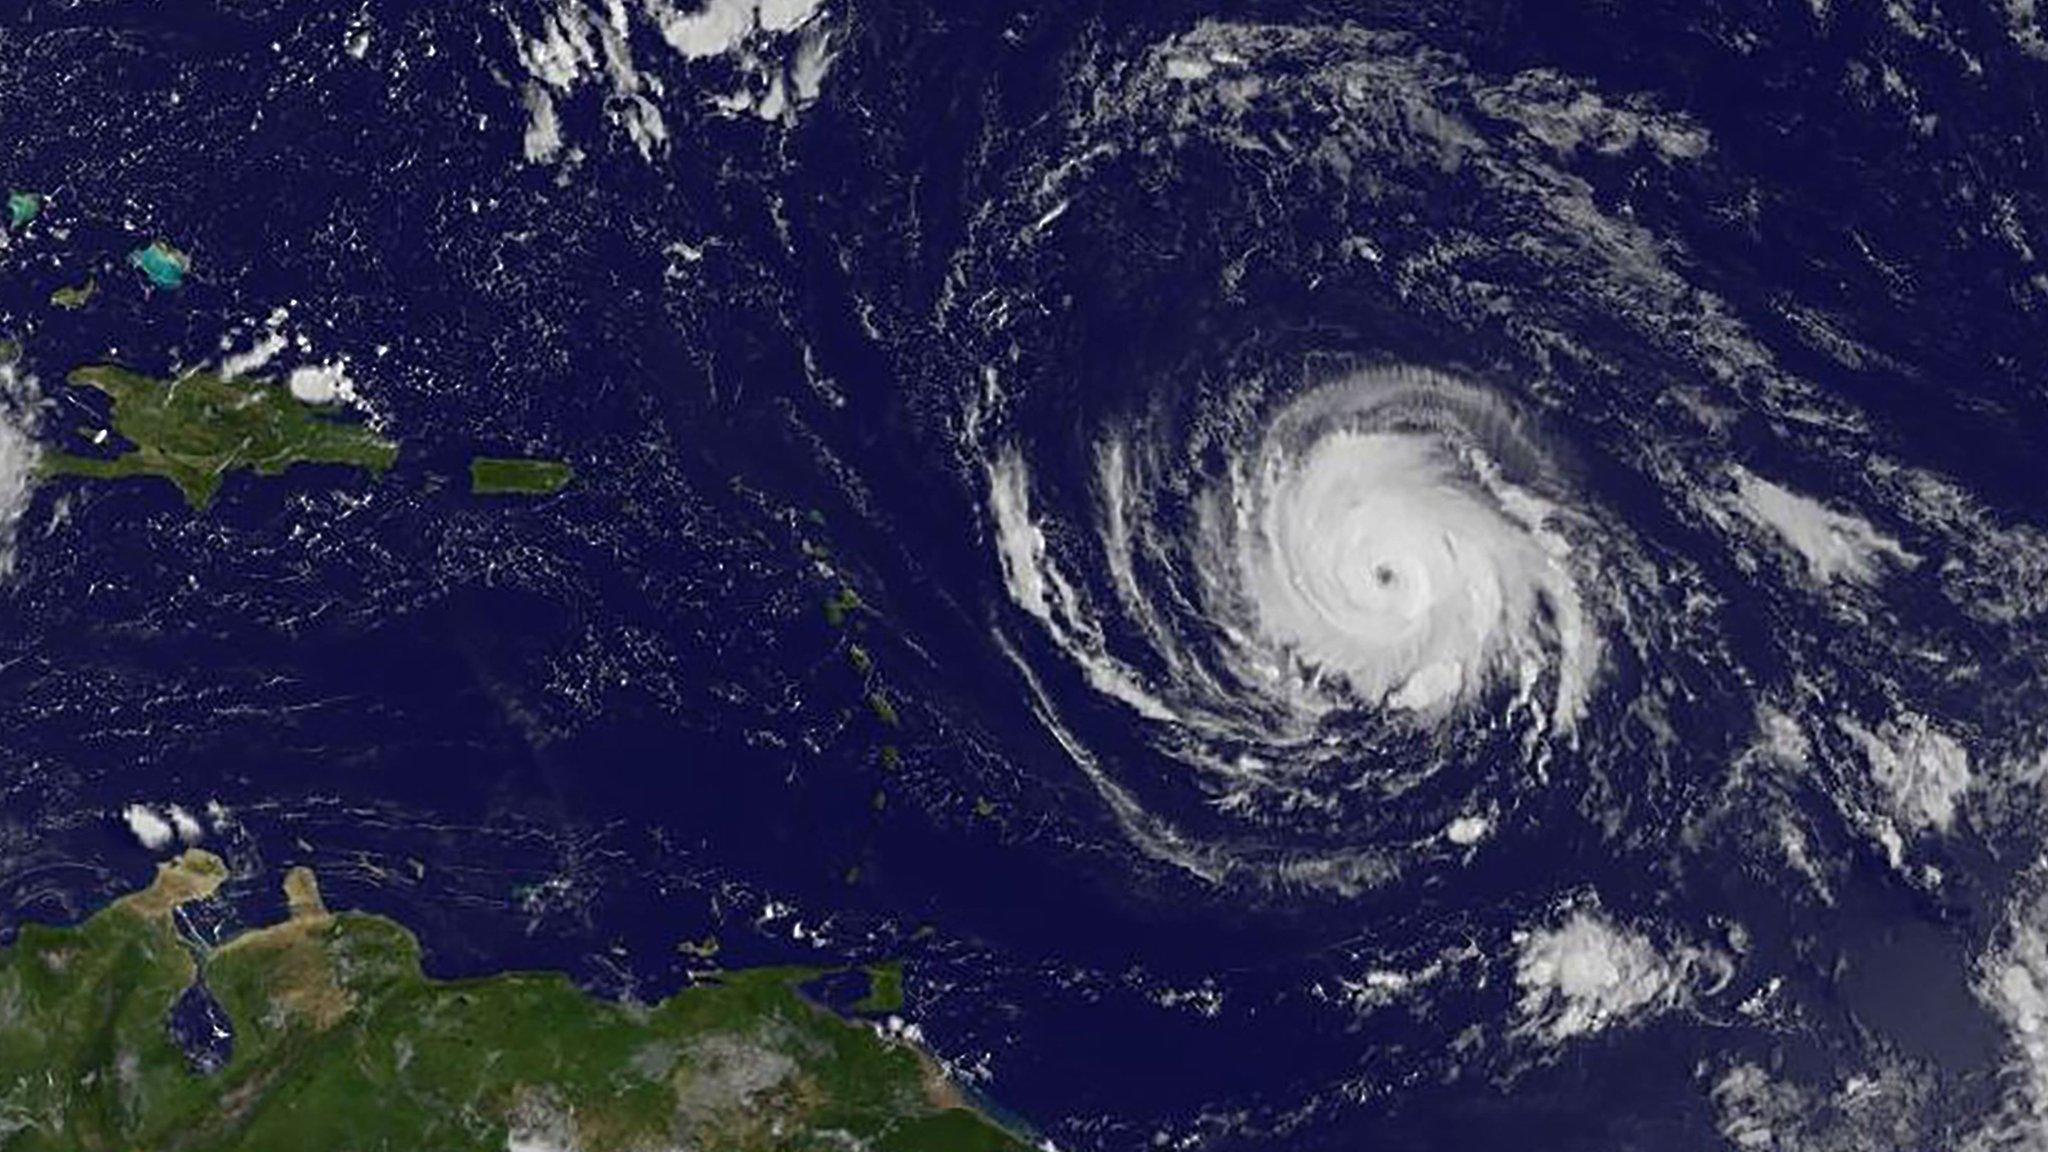 Hurricane Irma: Caribbean islands brace for powerful storm